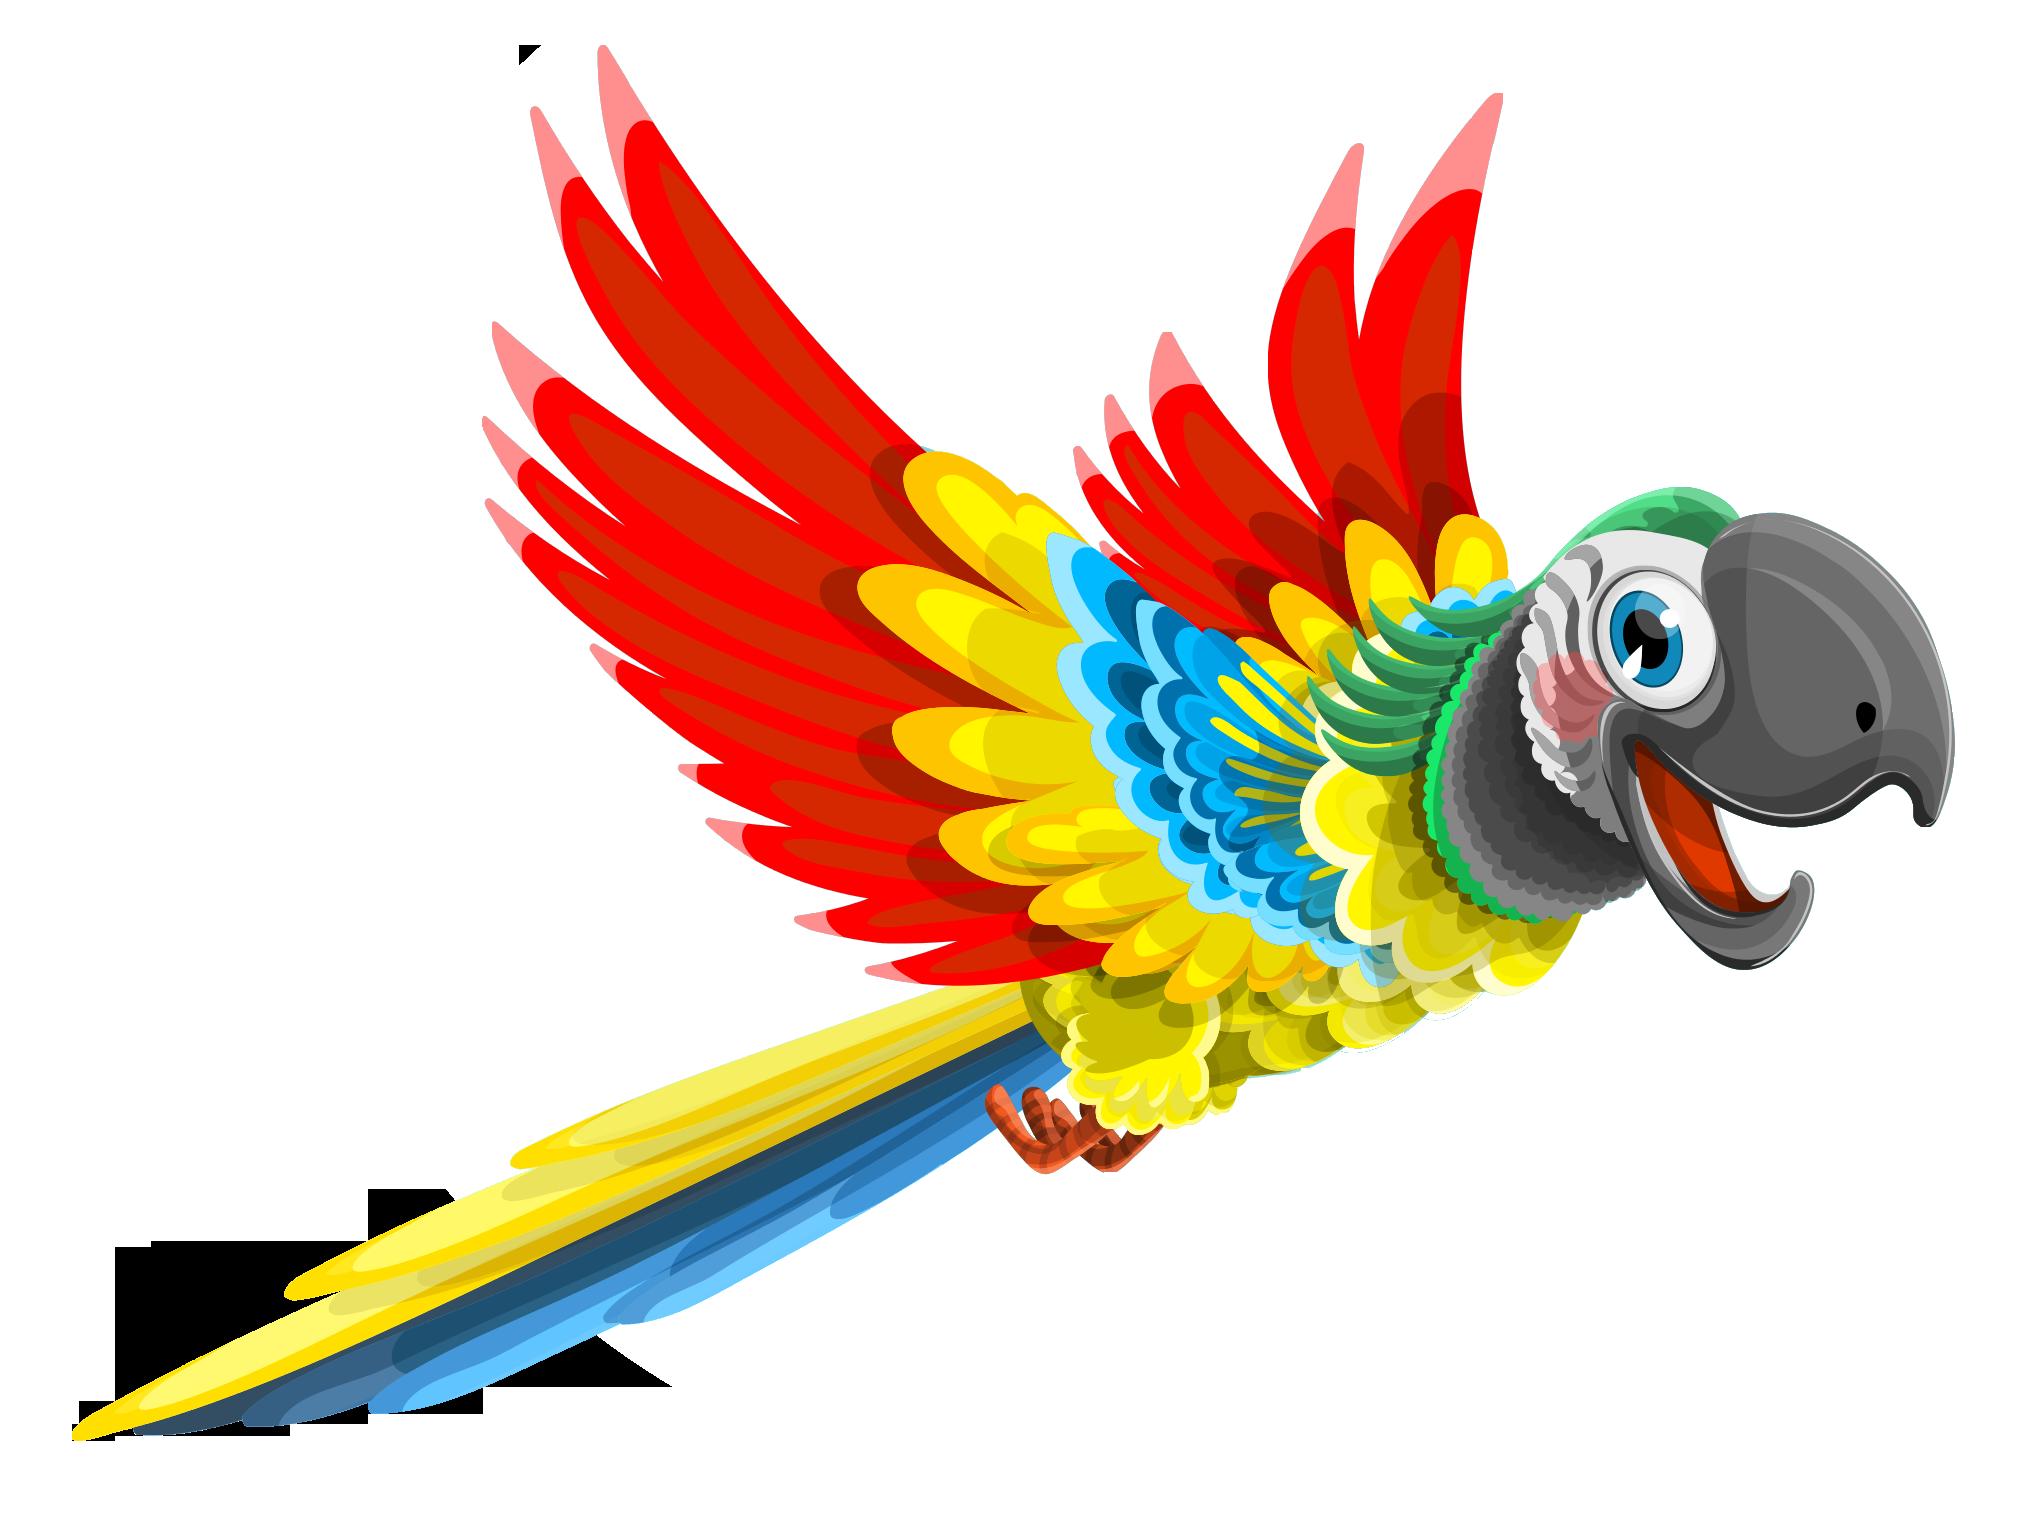 2019x1524 Parrot Vector PNG Transparent Image